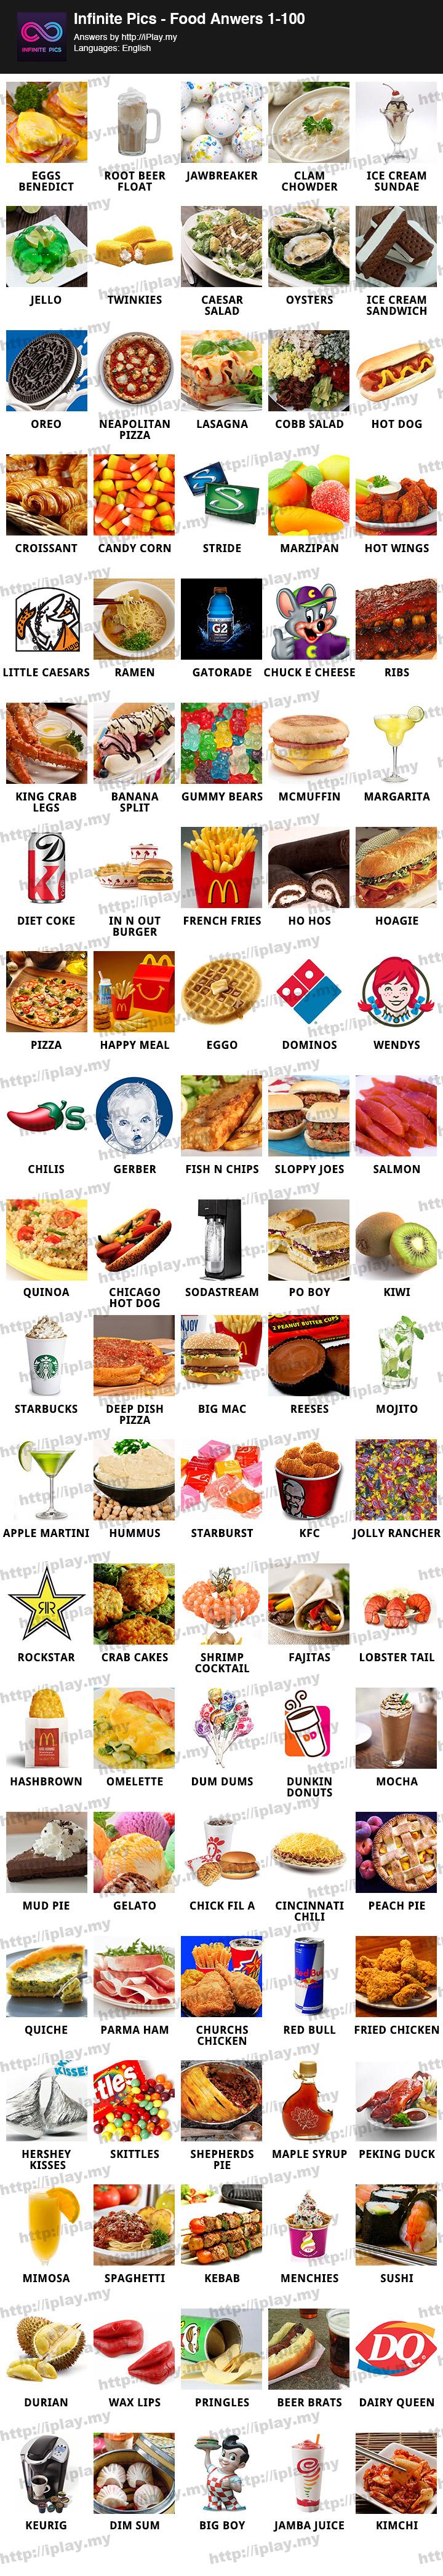 Infinite-Pics-food-Answers-1-100